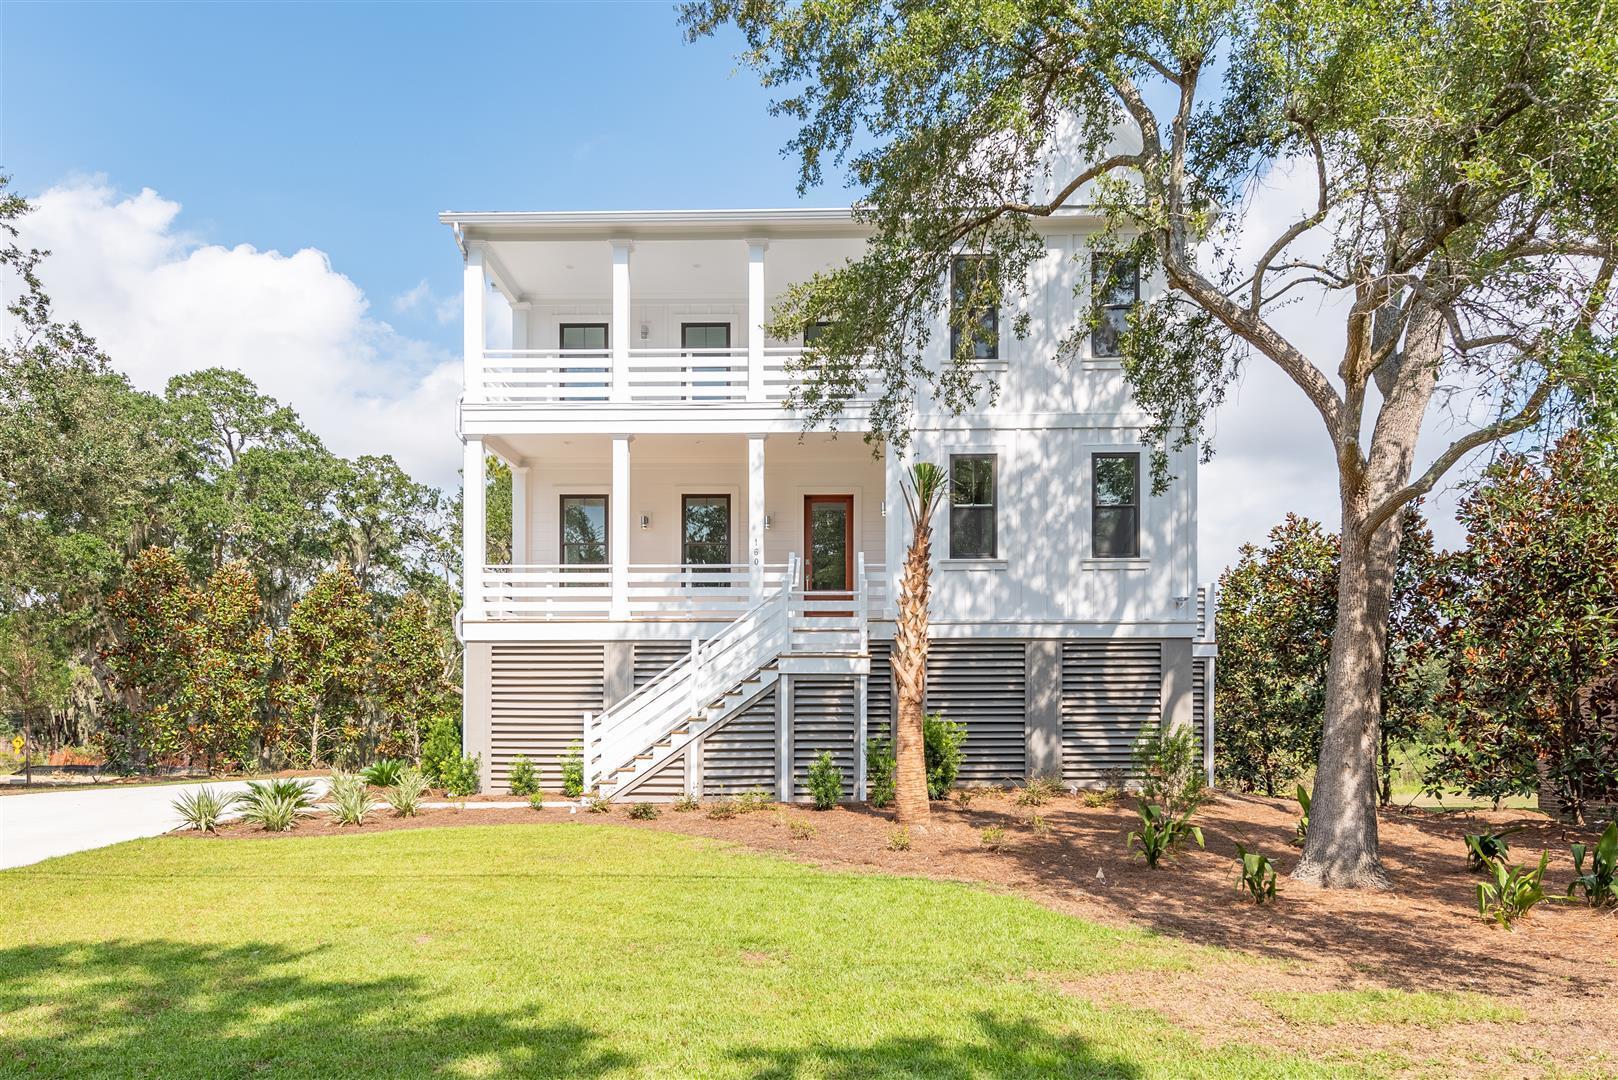 Scanlonville Homes For Sale - 160 5th, Mount Pleasant, SC - 23